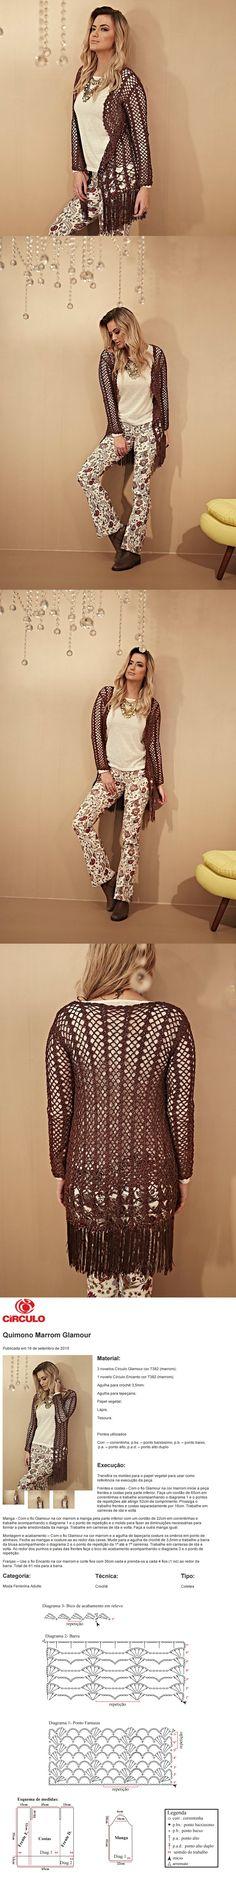 Receitas Círculo - Quimono Marrom Glamour